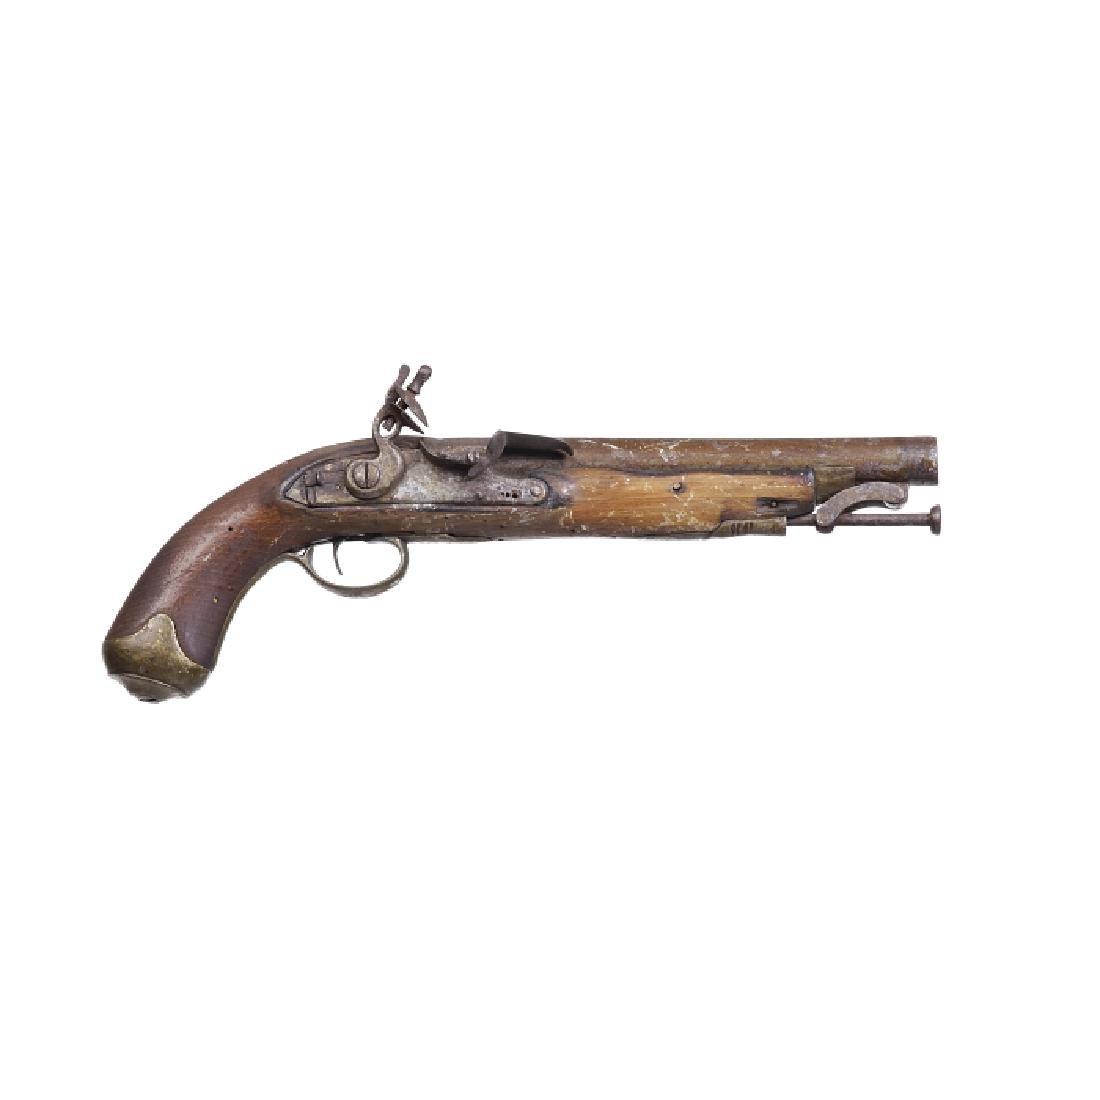 English military flintlock pistol